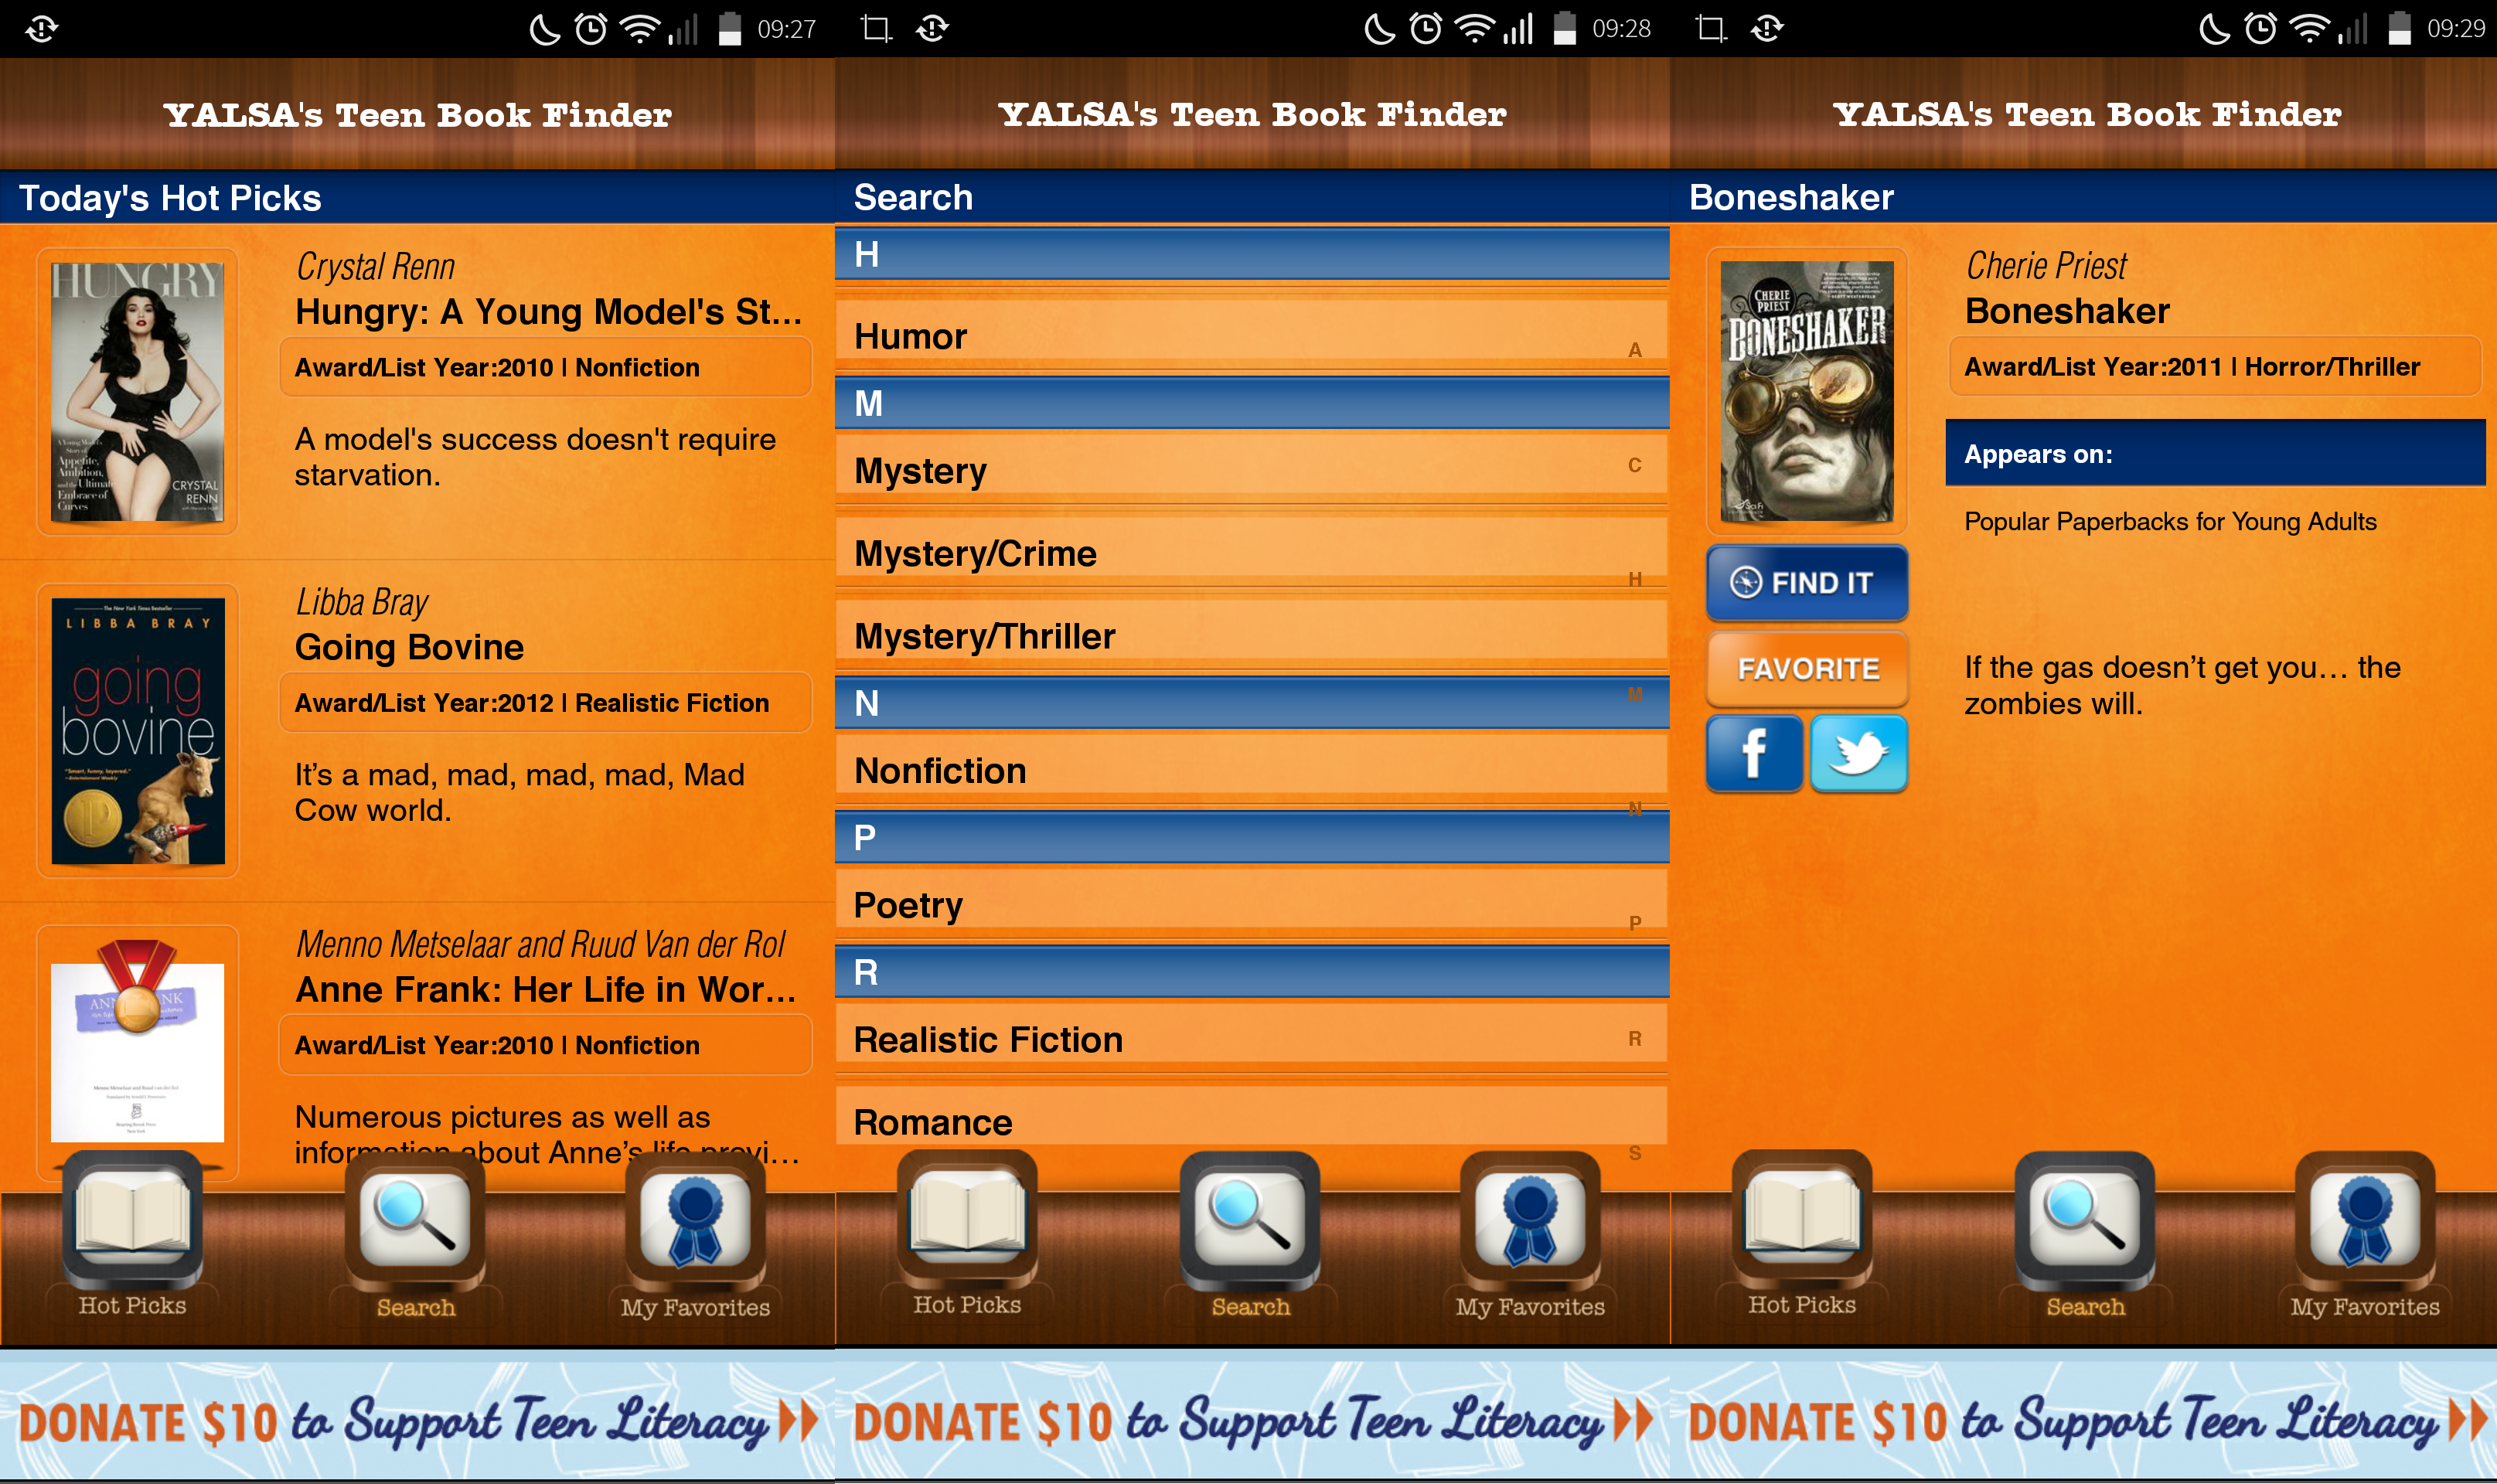 YALSA_App